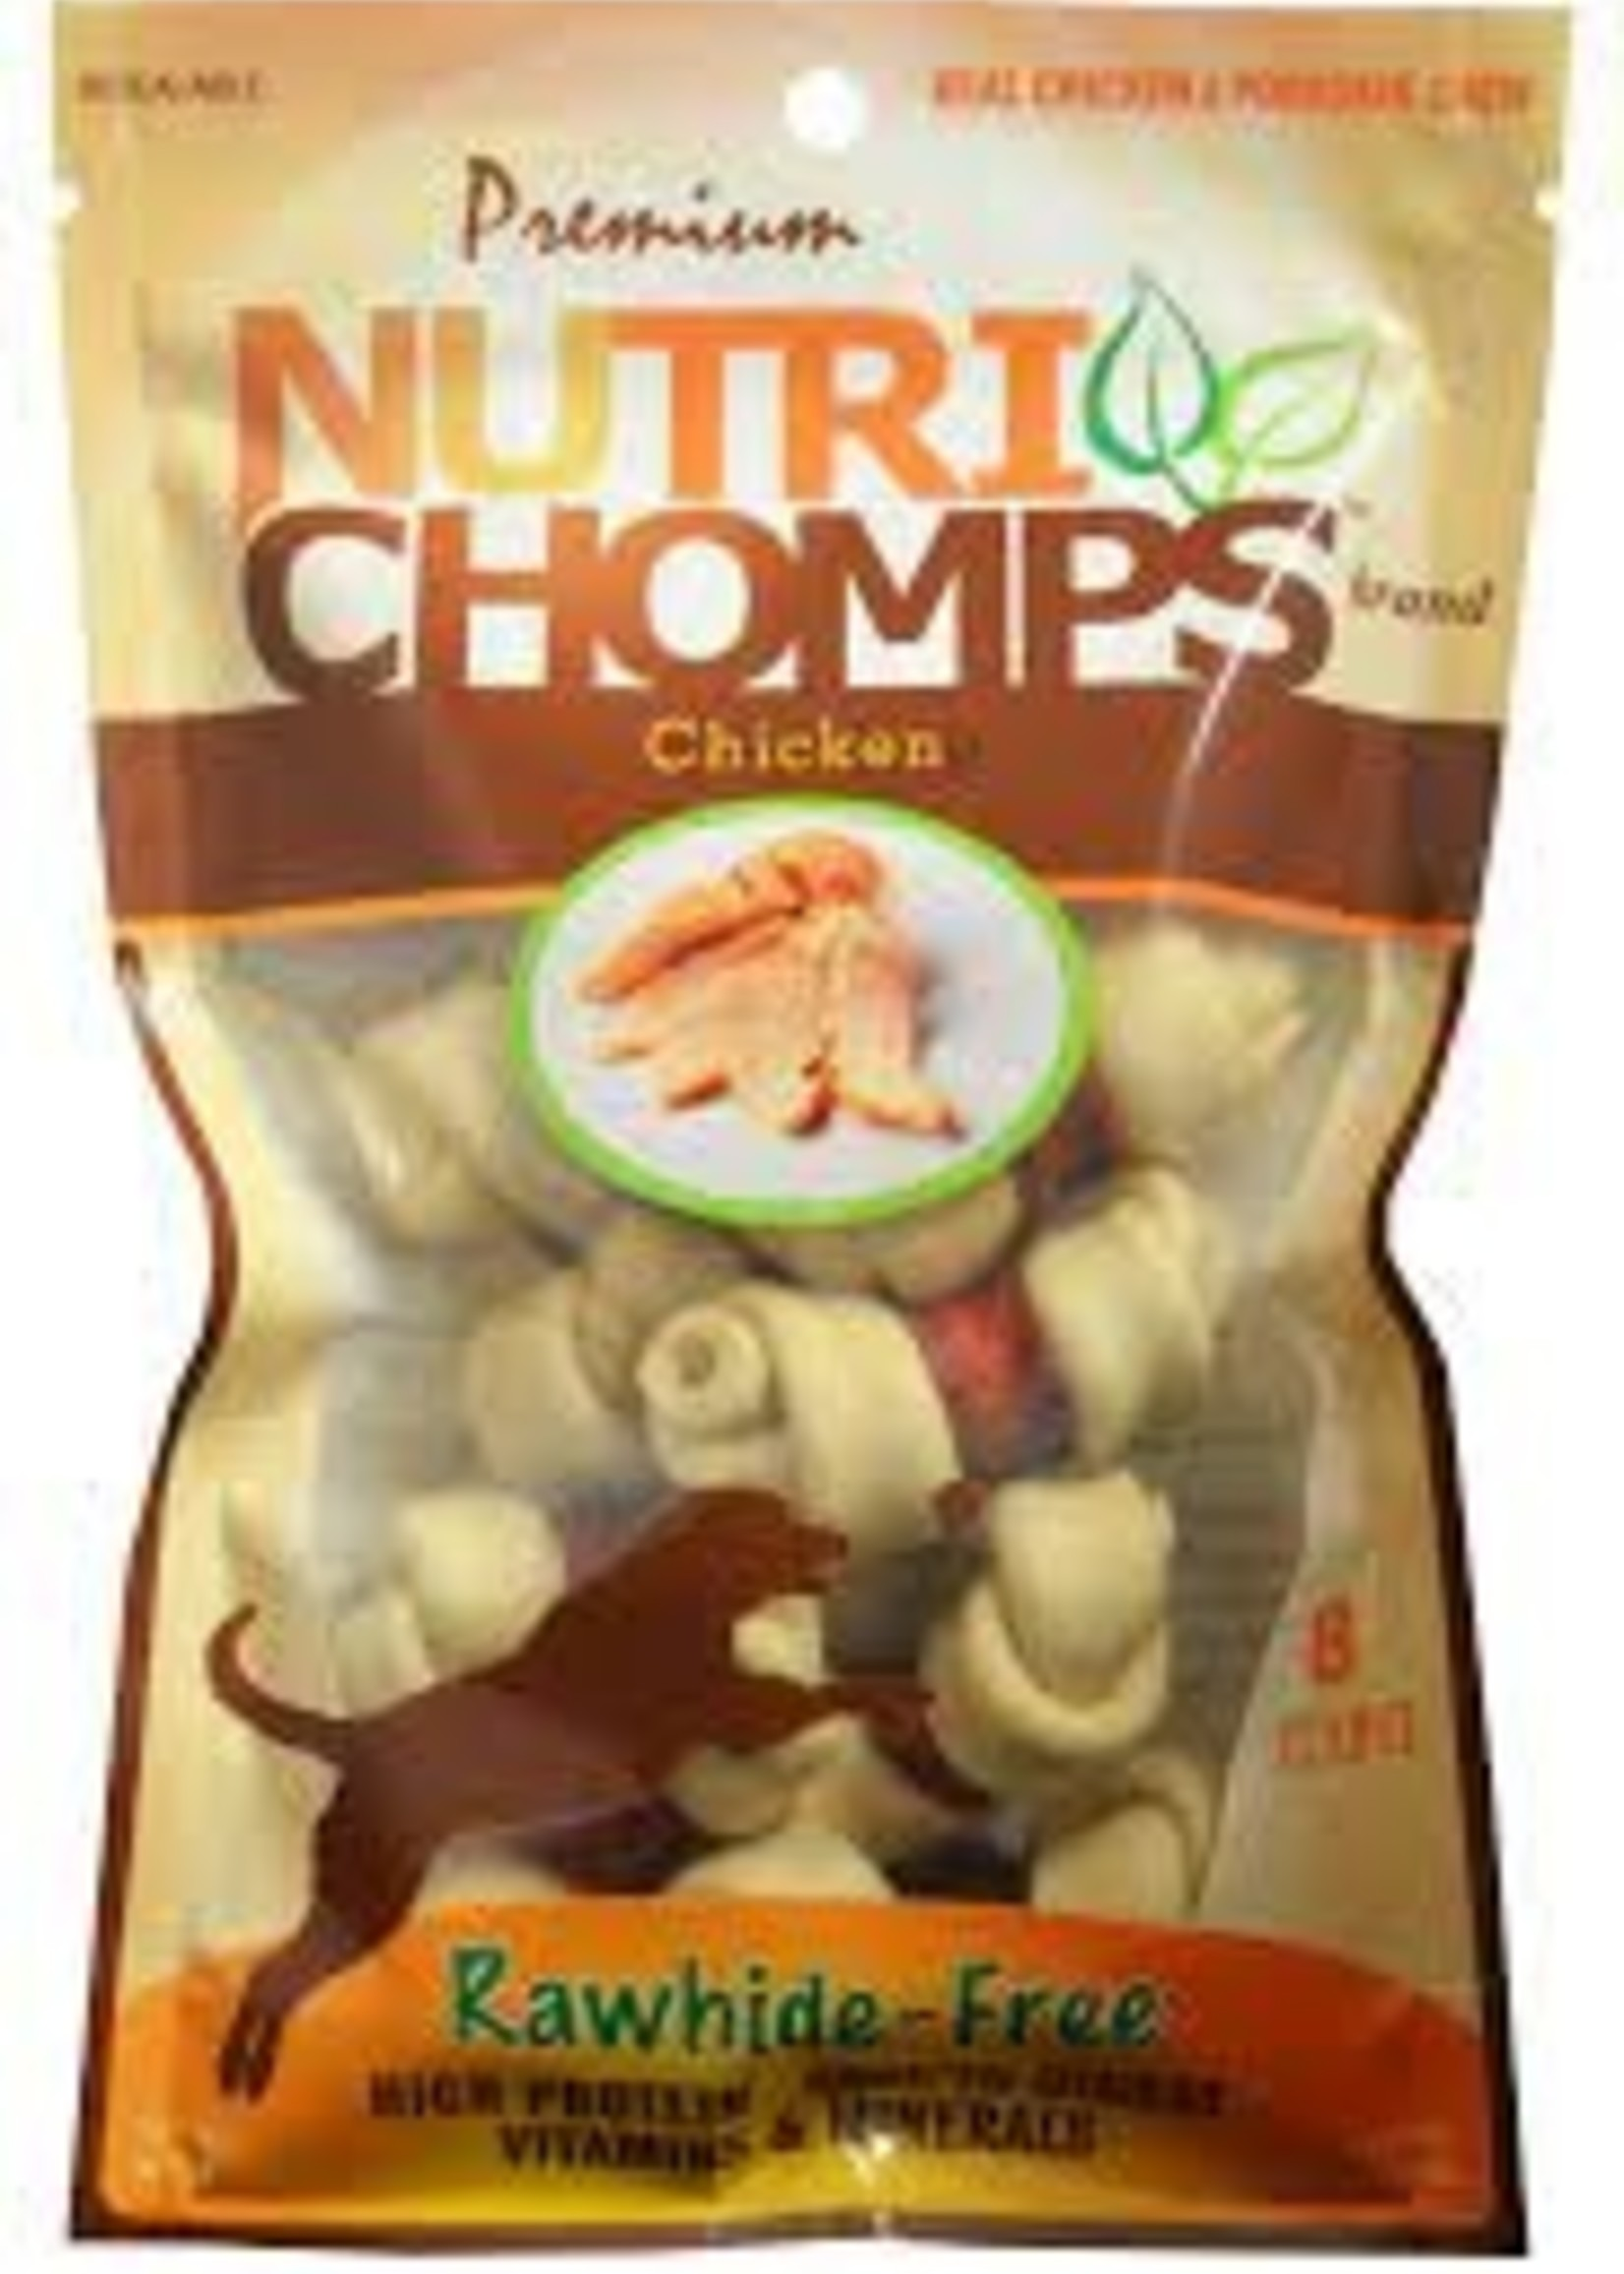 Nutri Chomp Nutri Chomps Advanced Chicken Knot Wrap 8 ct